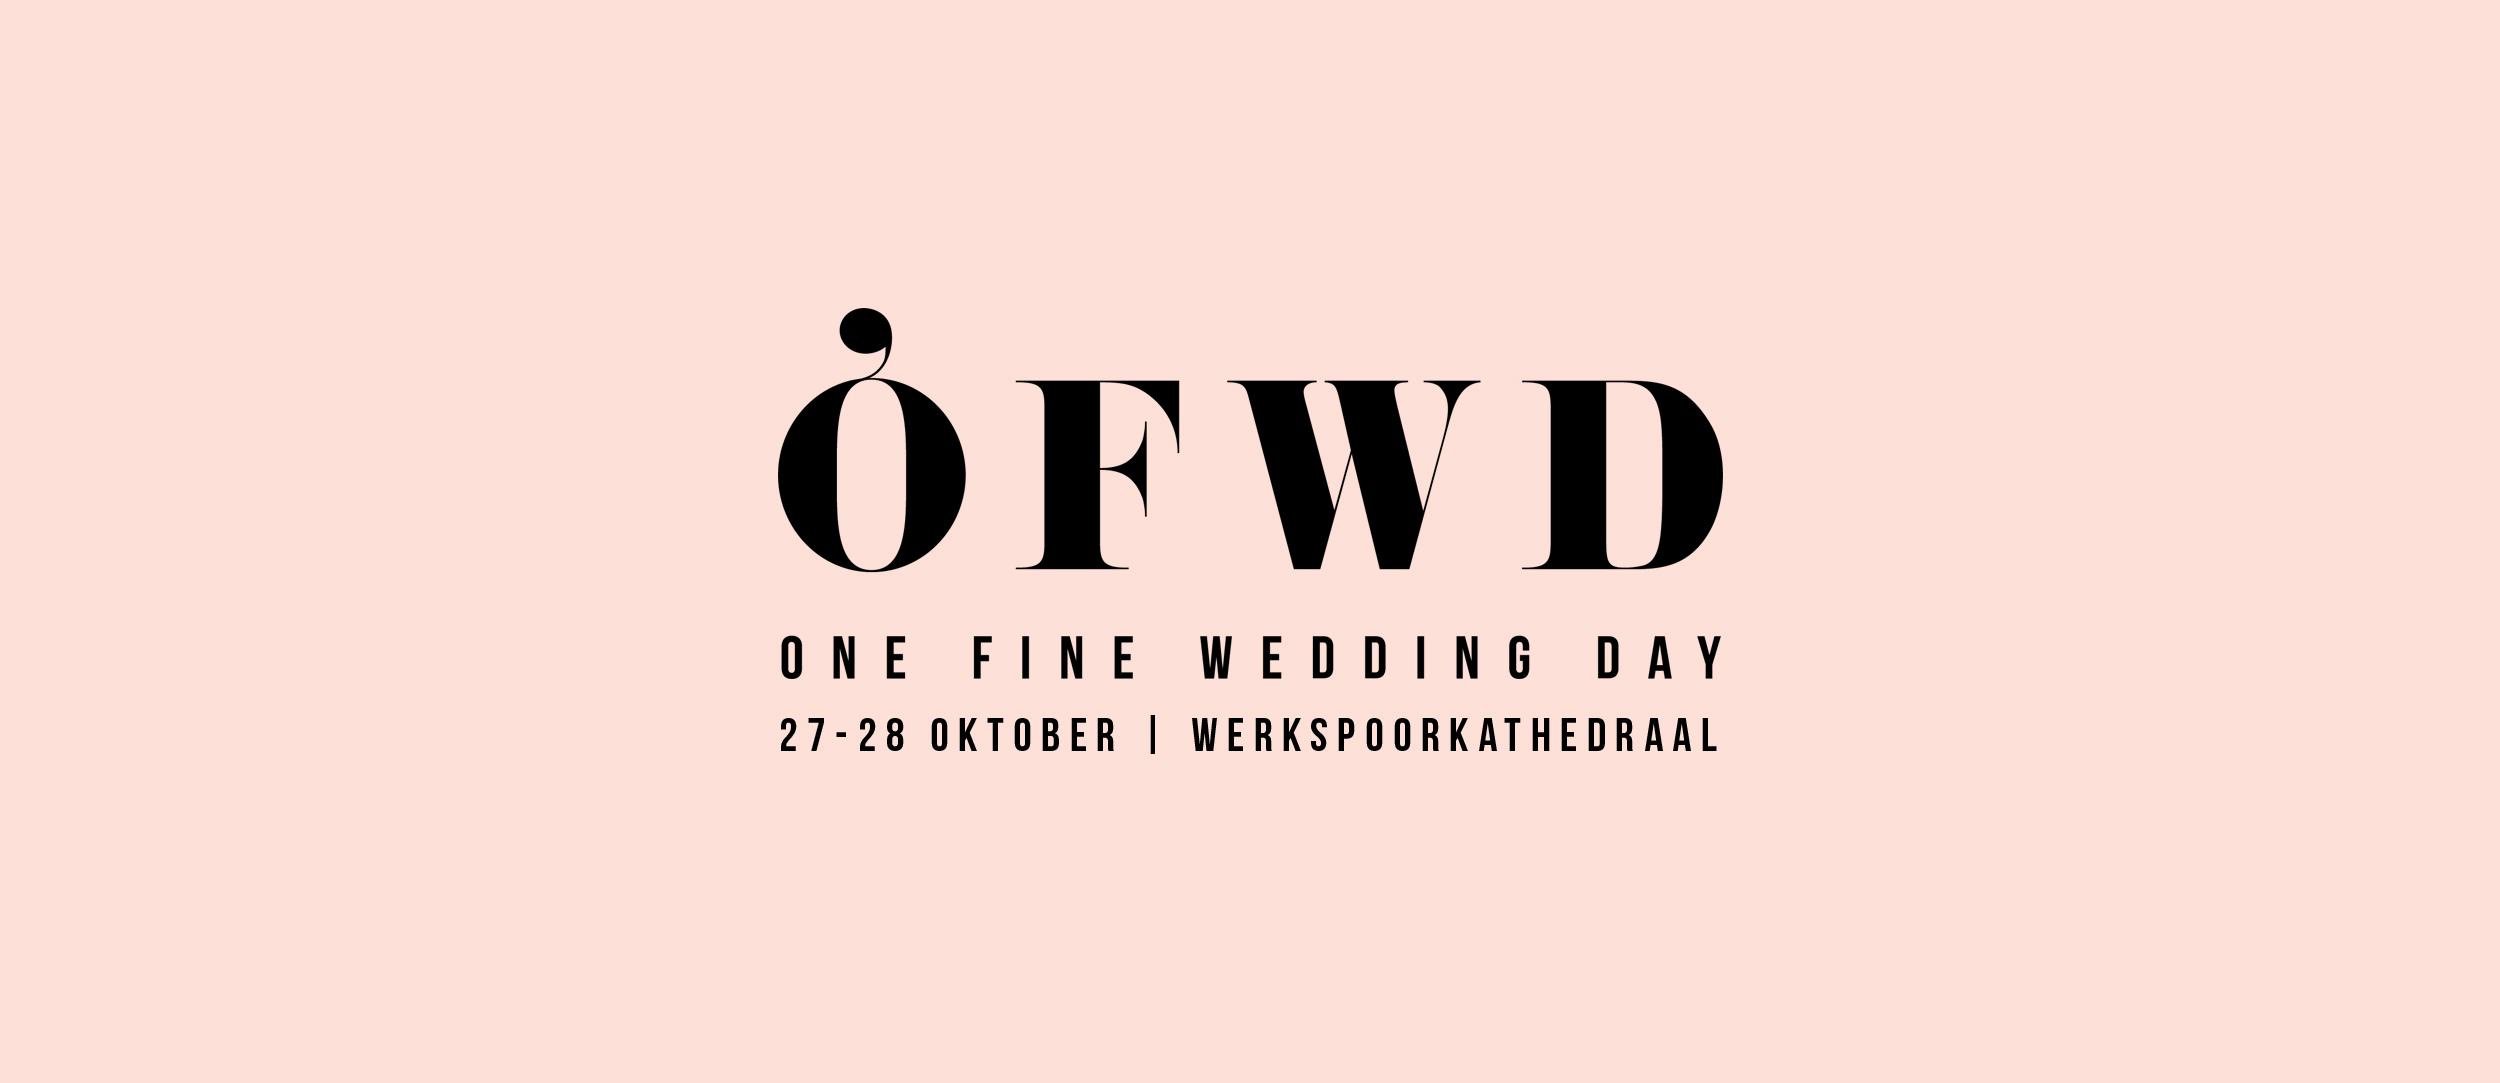 One Fine Wedding Day